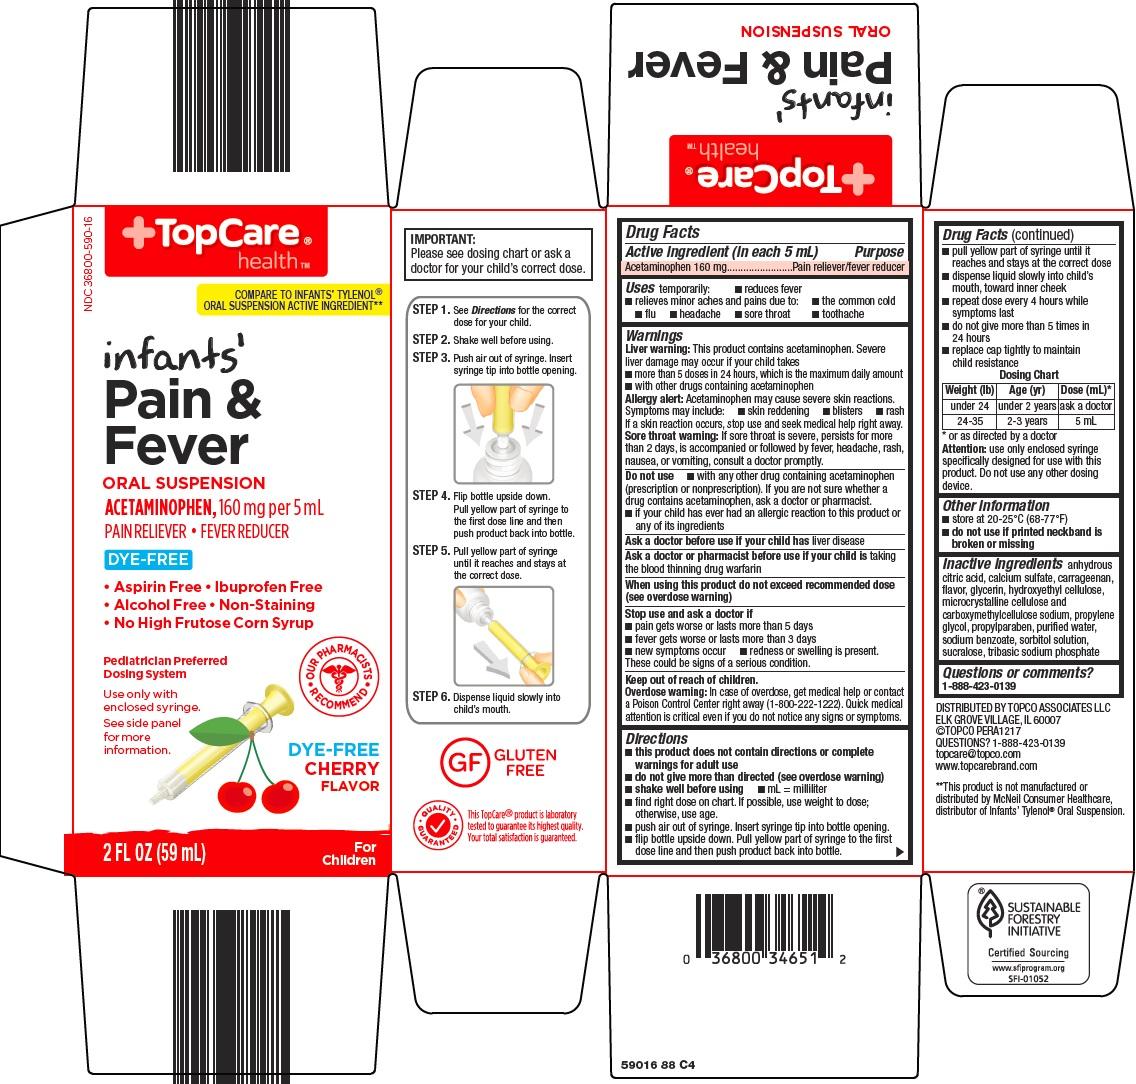 59088-infants-pain-and-fever.jpg